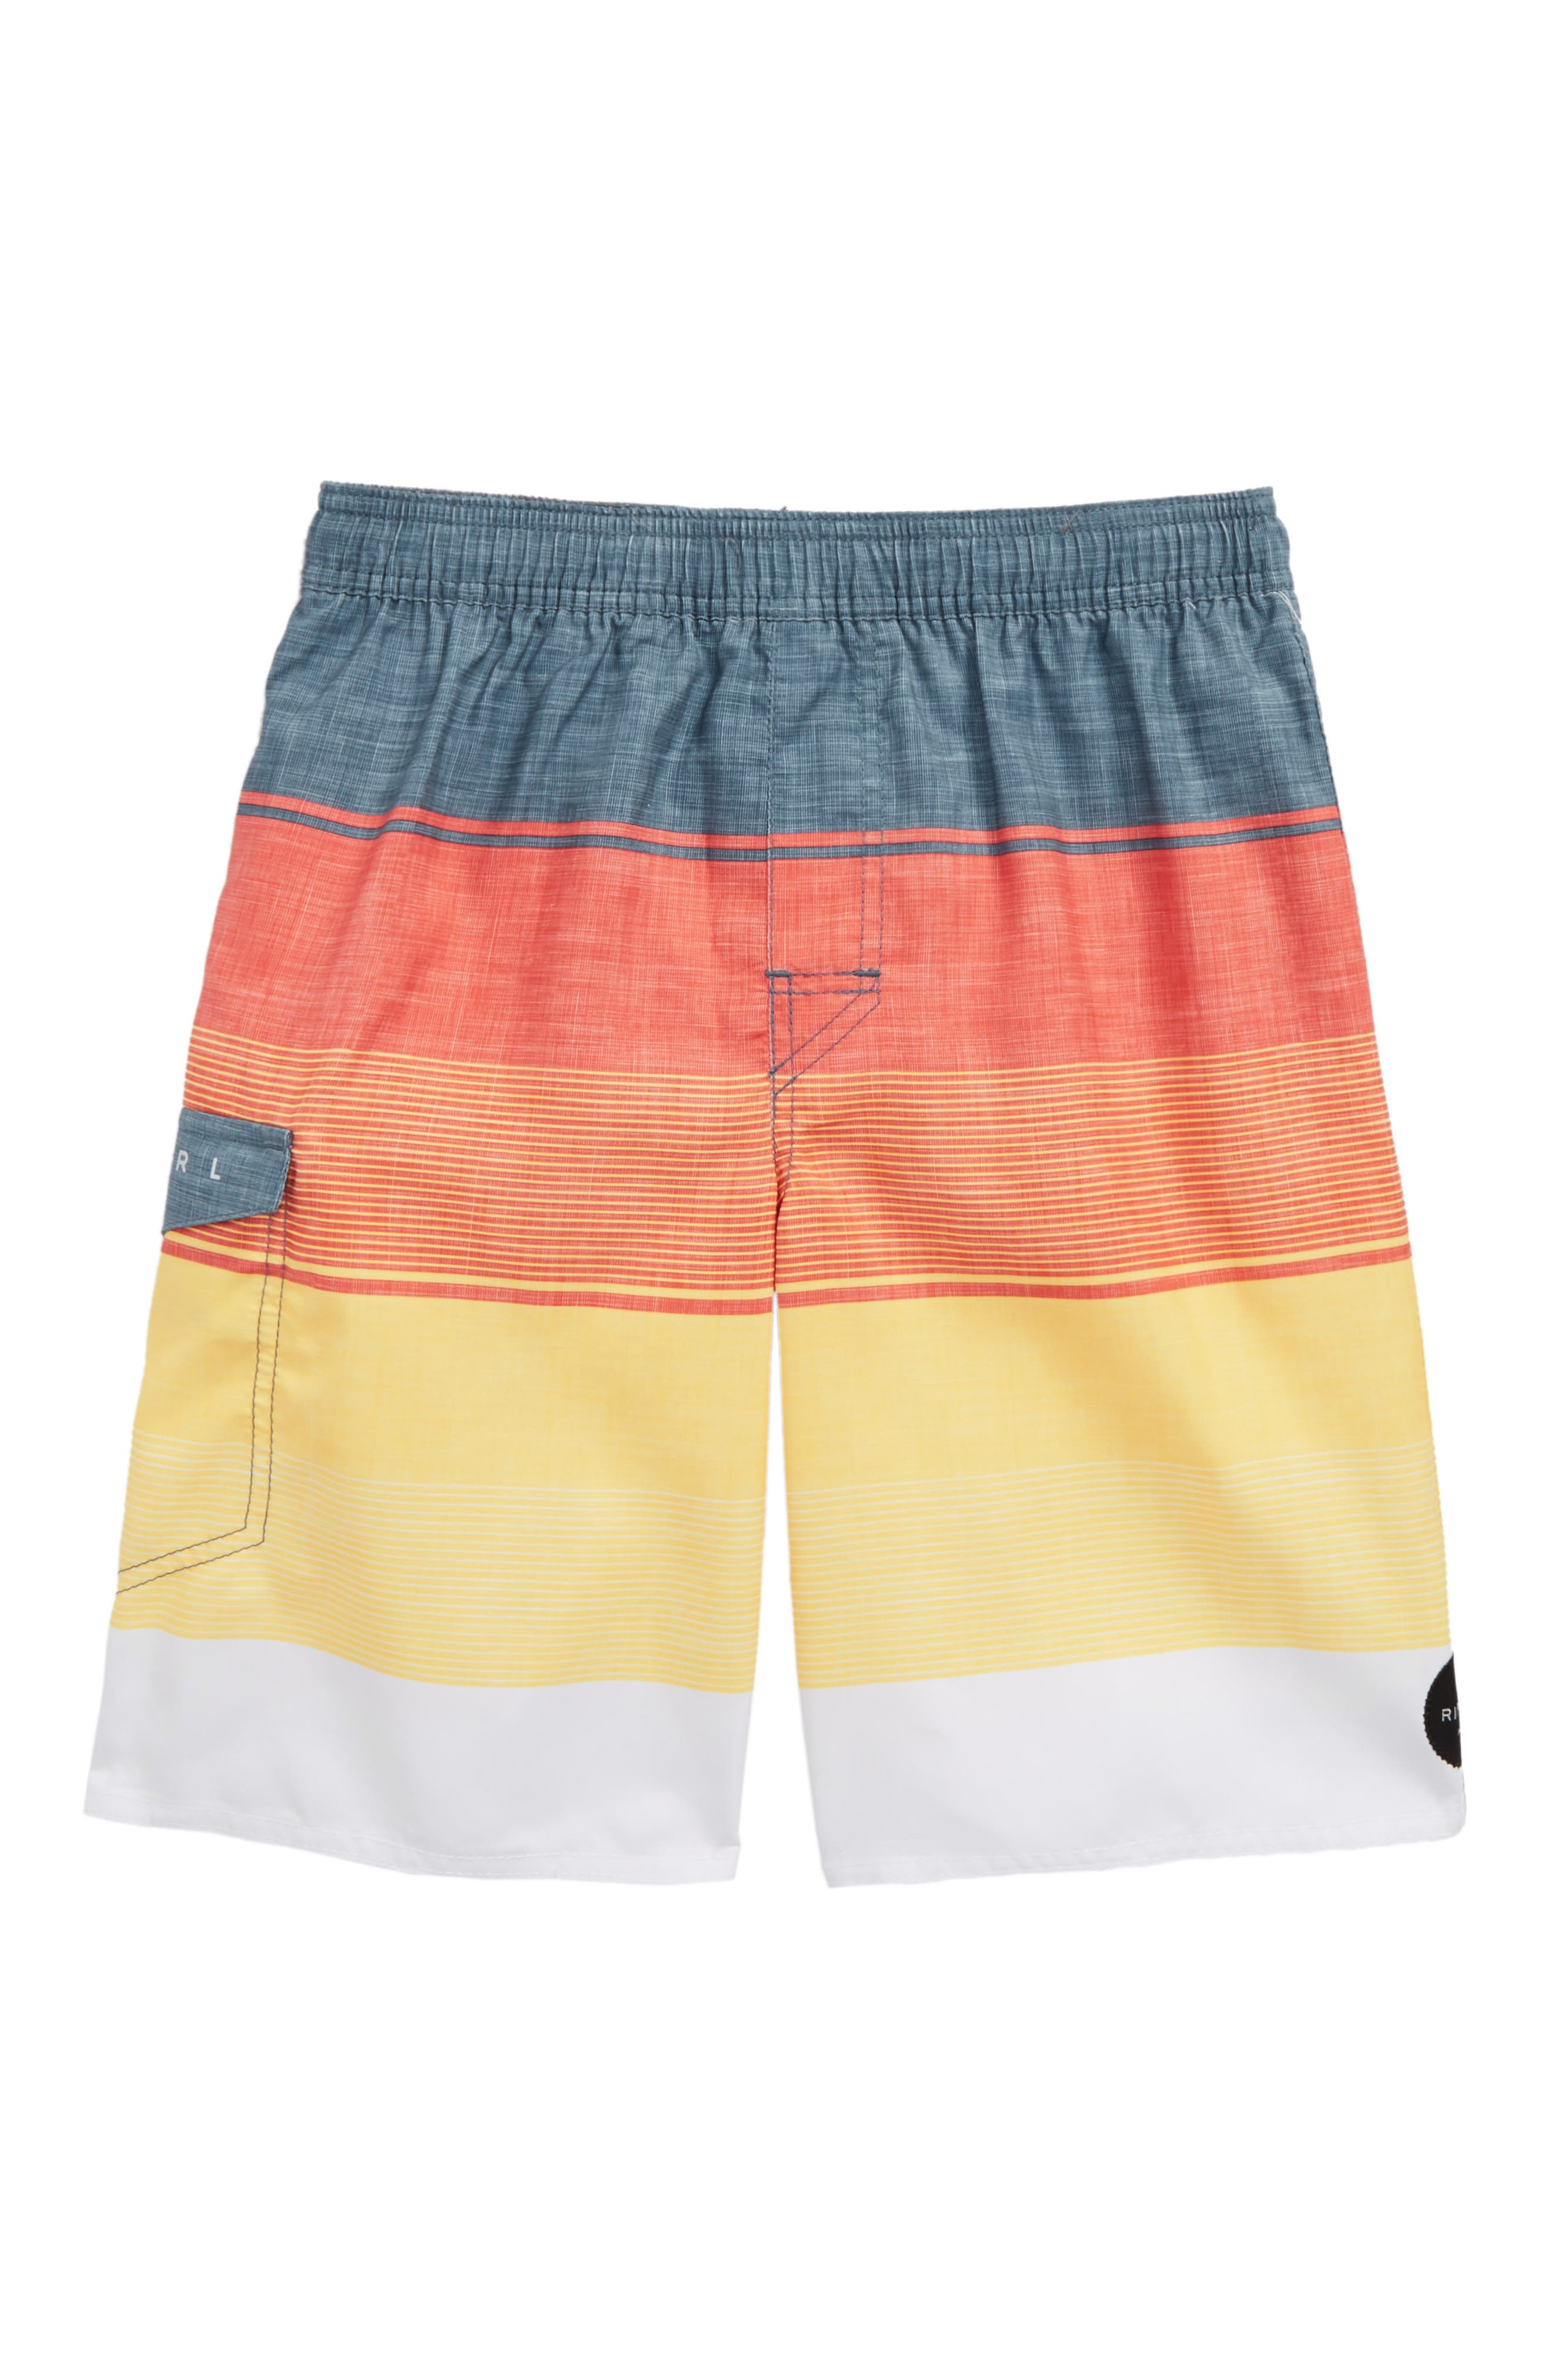 Good Times Volley Shorts,                         Main,                         color,